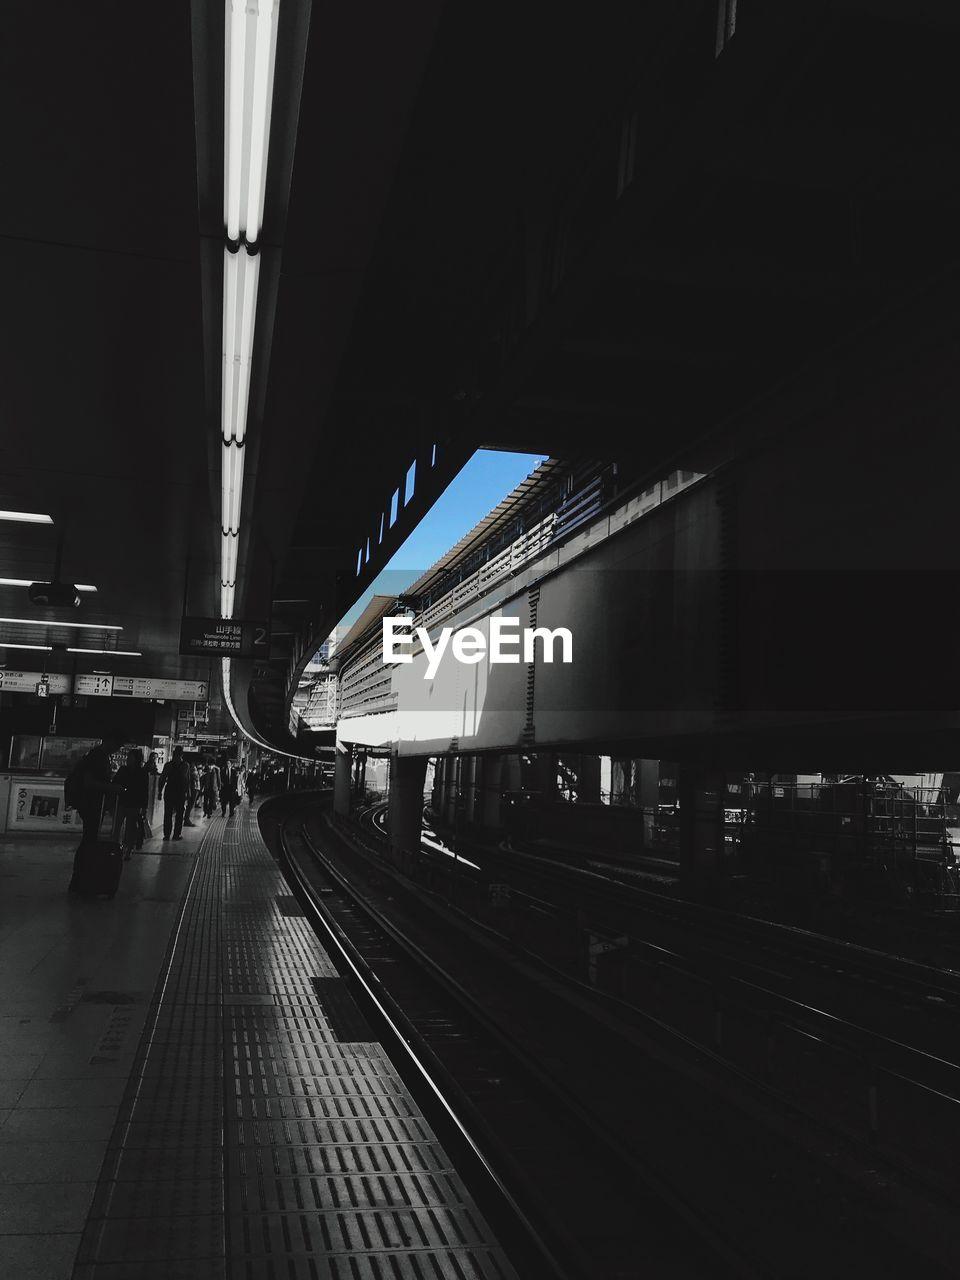 TRAIN AT RAILROAD STATION PLATFORM AGAINST CLEAR SKY